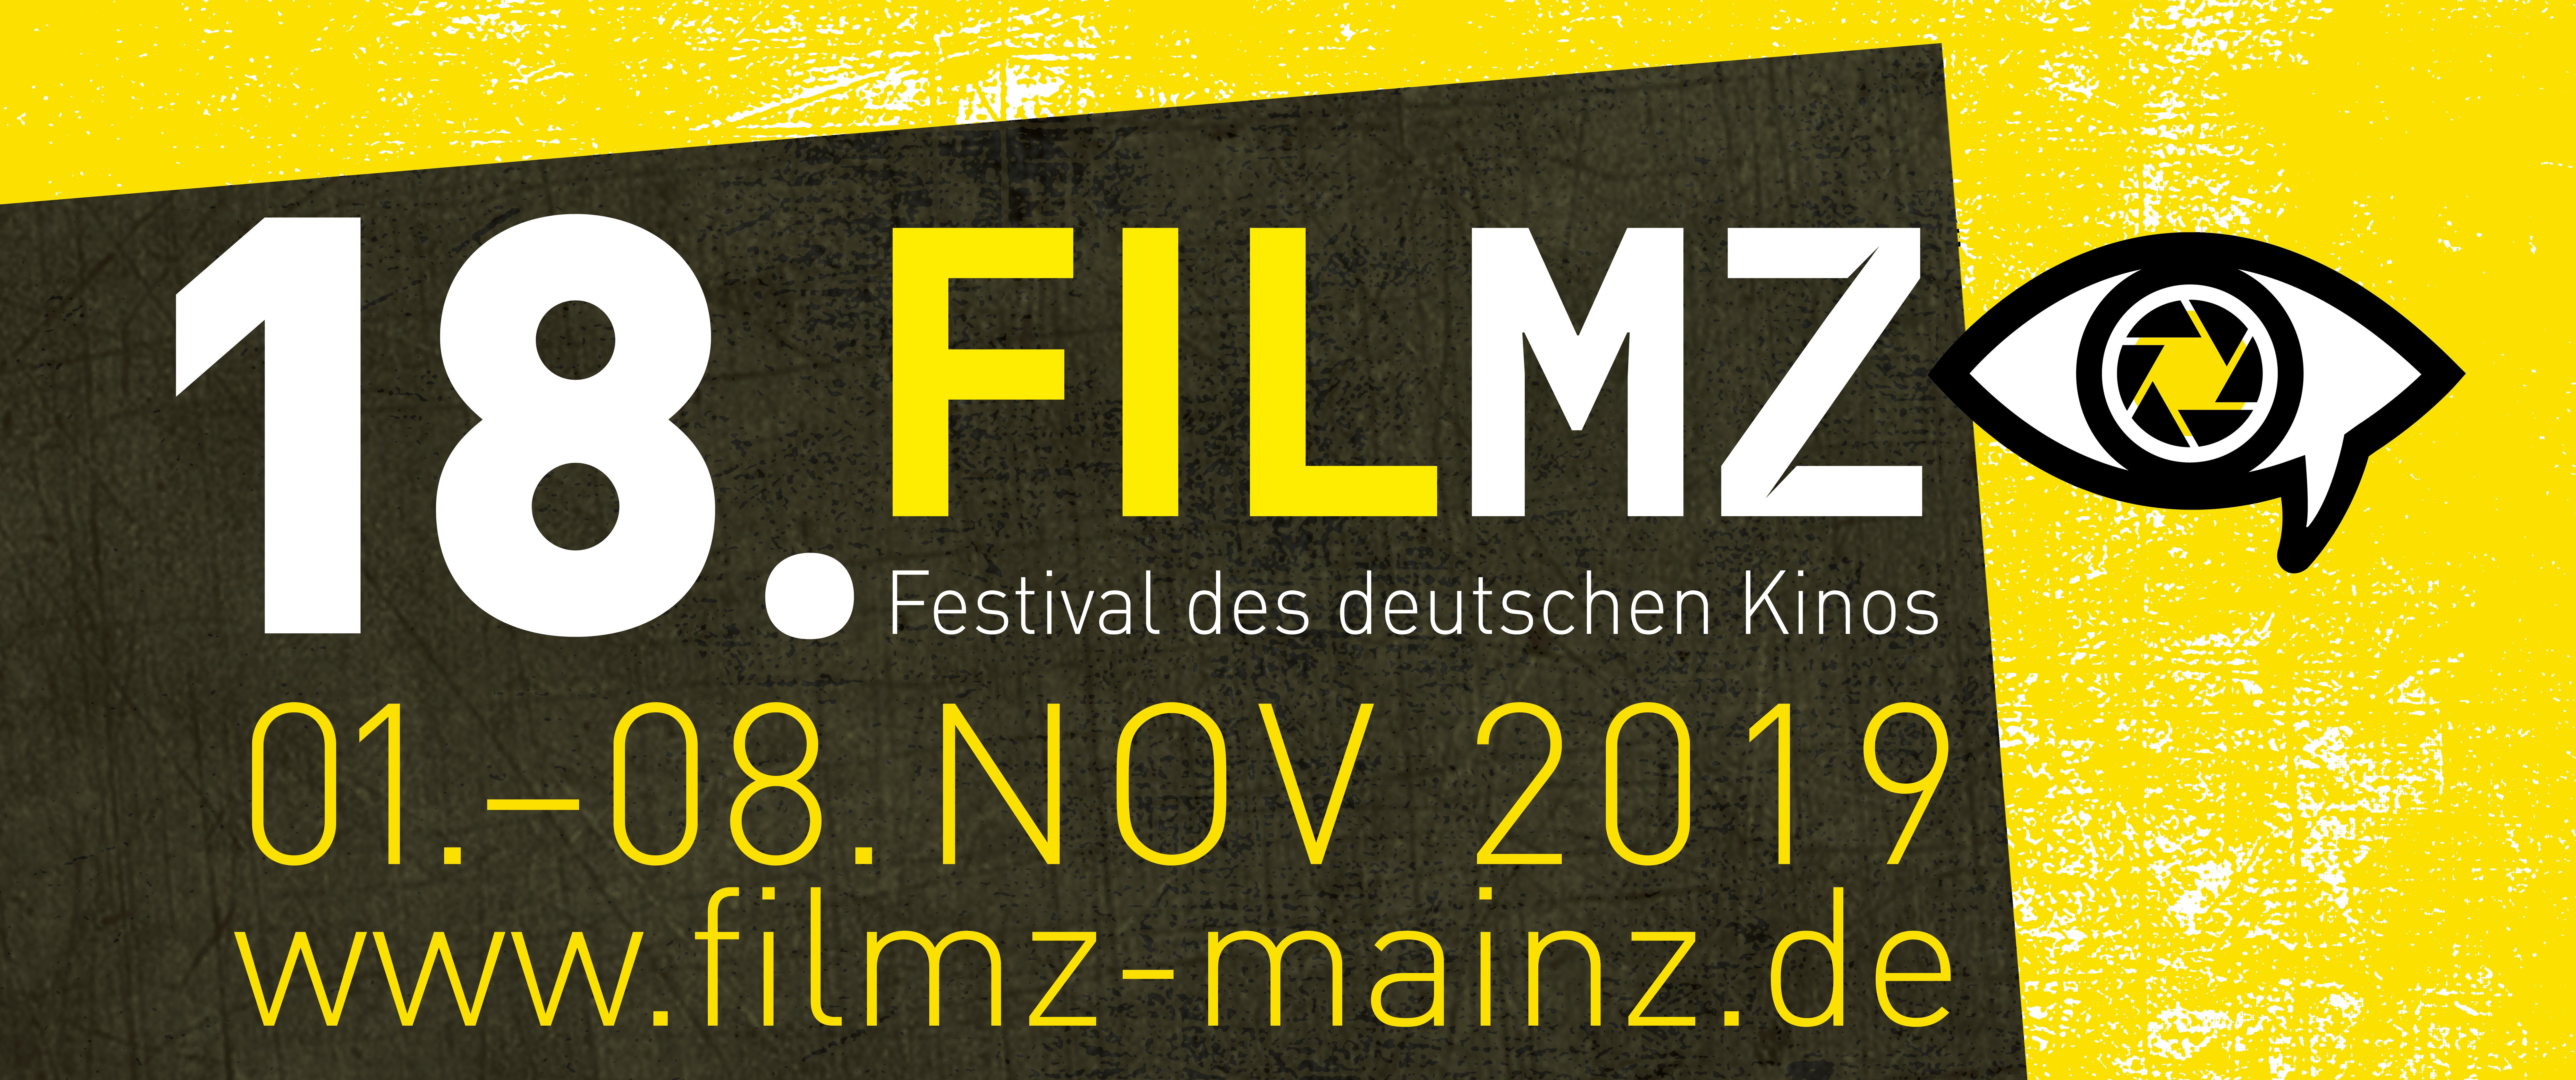 Filmz - Festival des deutschen Kinos // 01. Nov - 08. Nov 2019